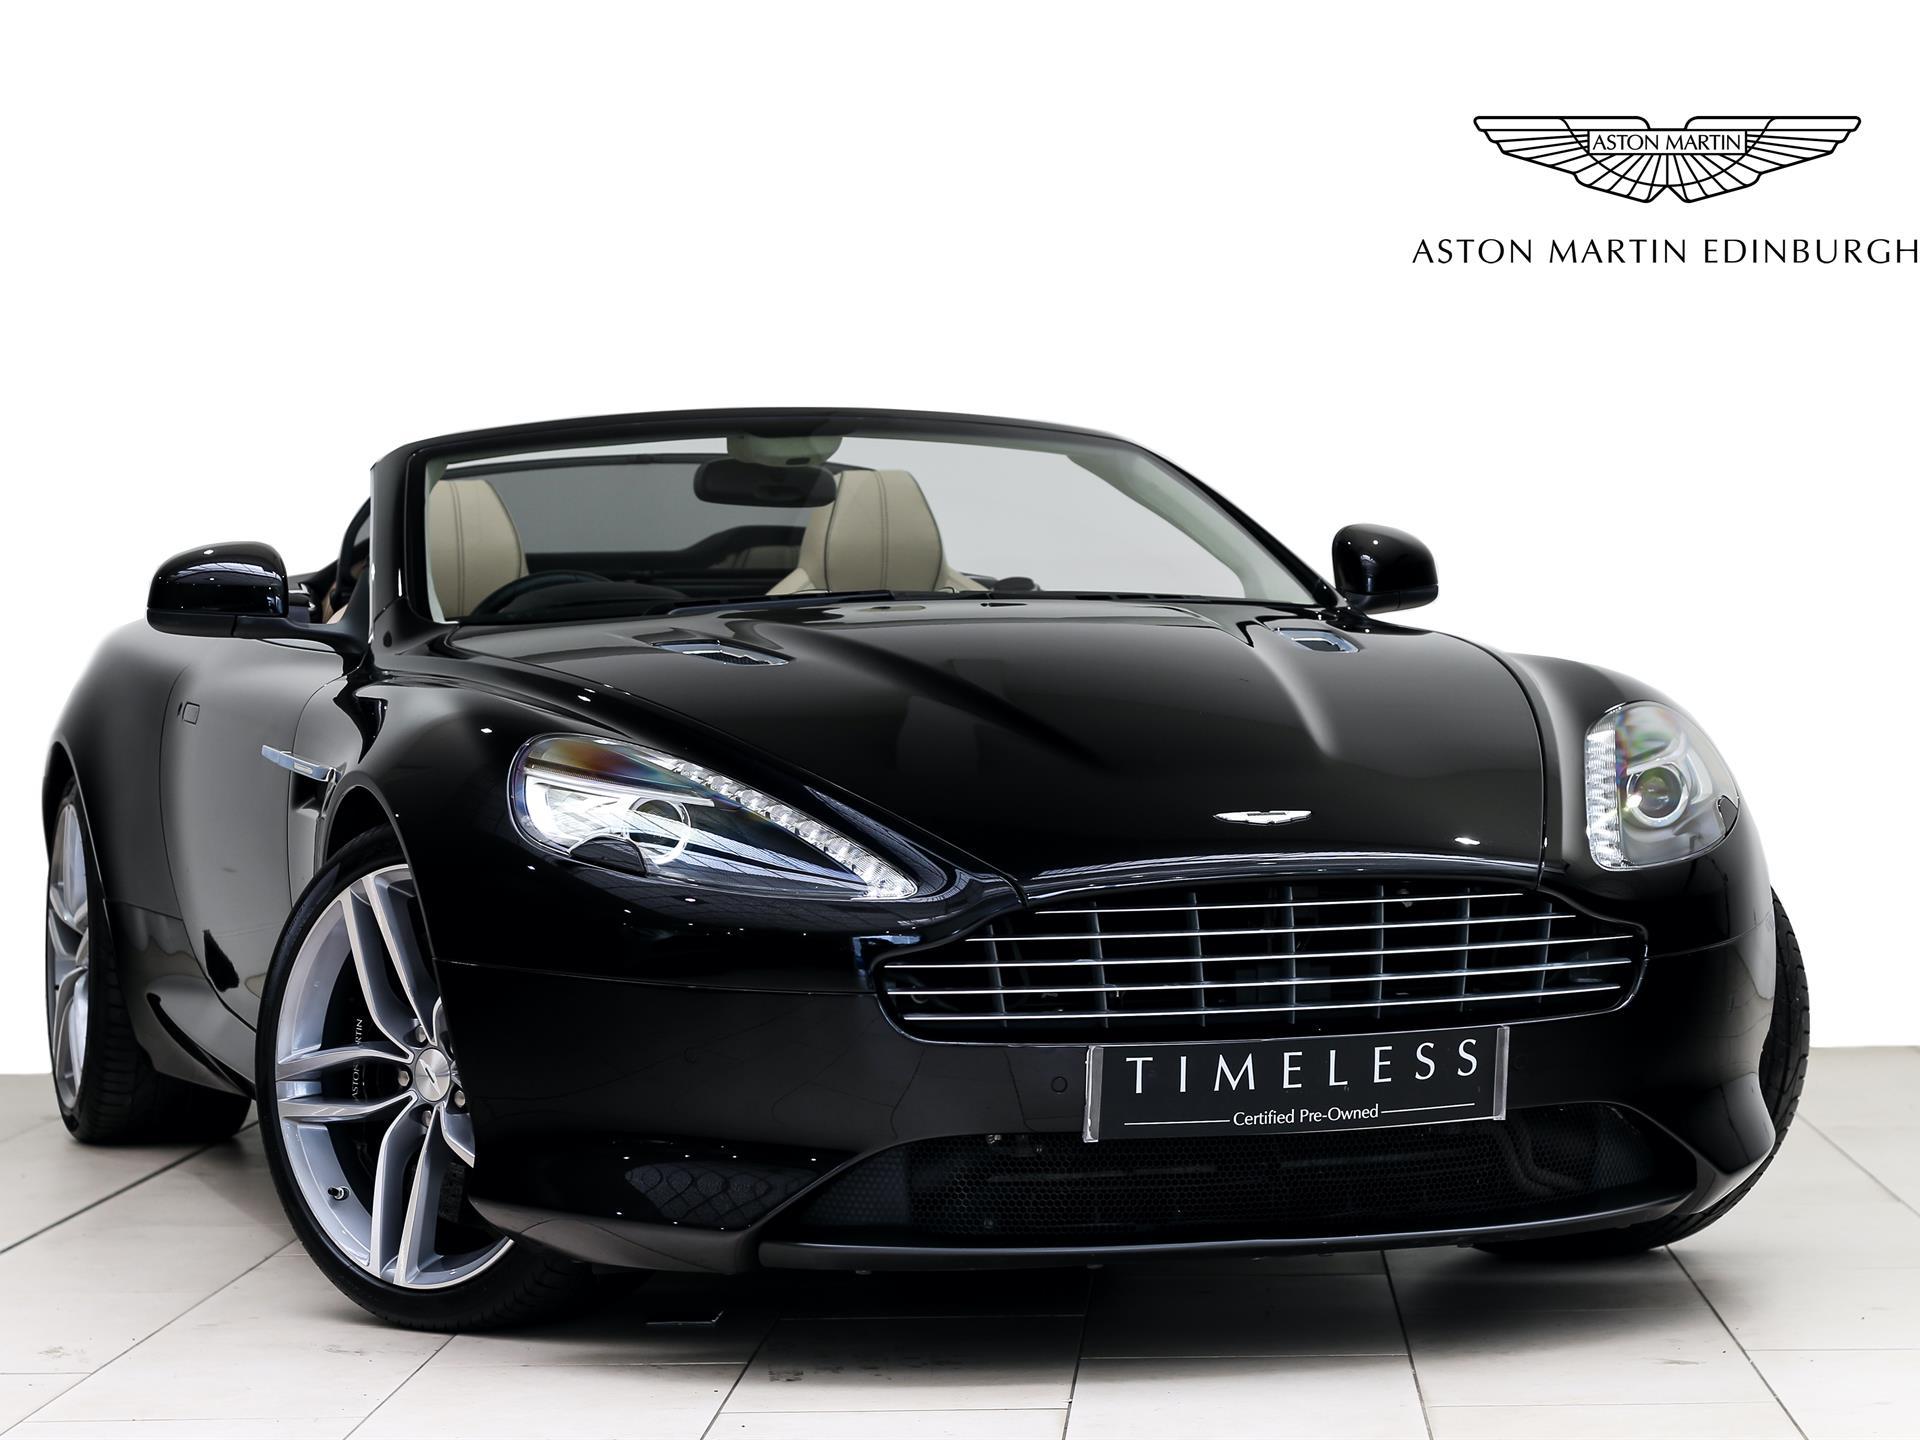 Aston Martin Lagonda - Pre-Owned & Used Aston Martins - Car Details on